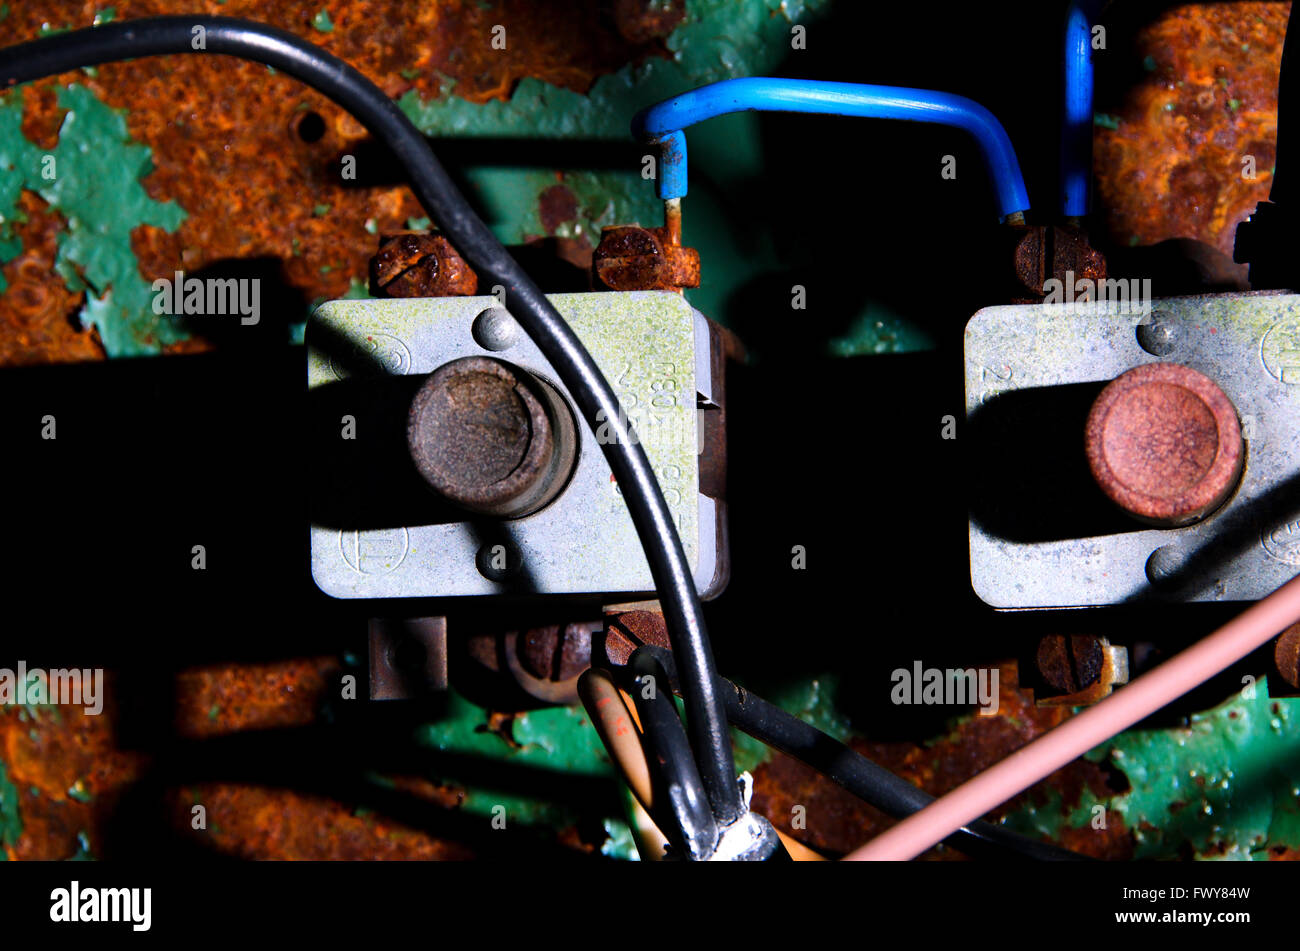 Retro Telephone Switchboard Stockfotos & Retro Telephone Switchboard ...